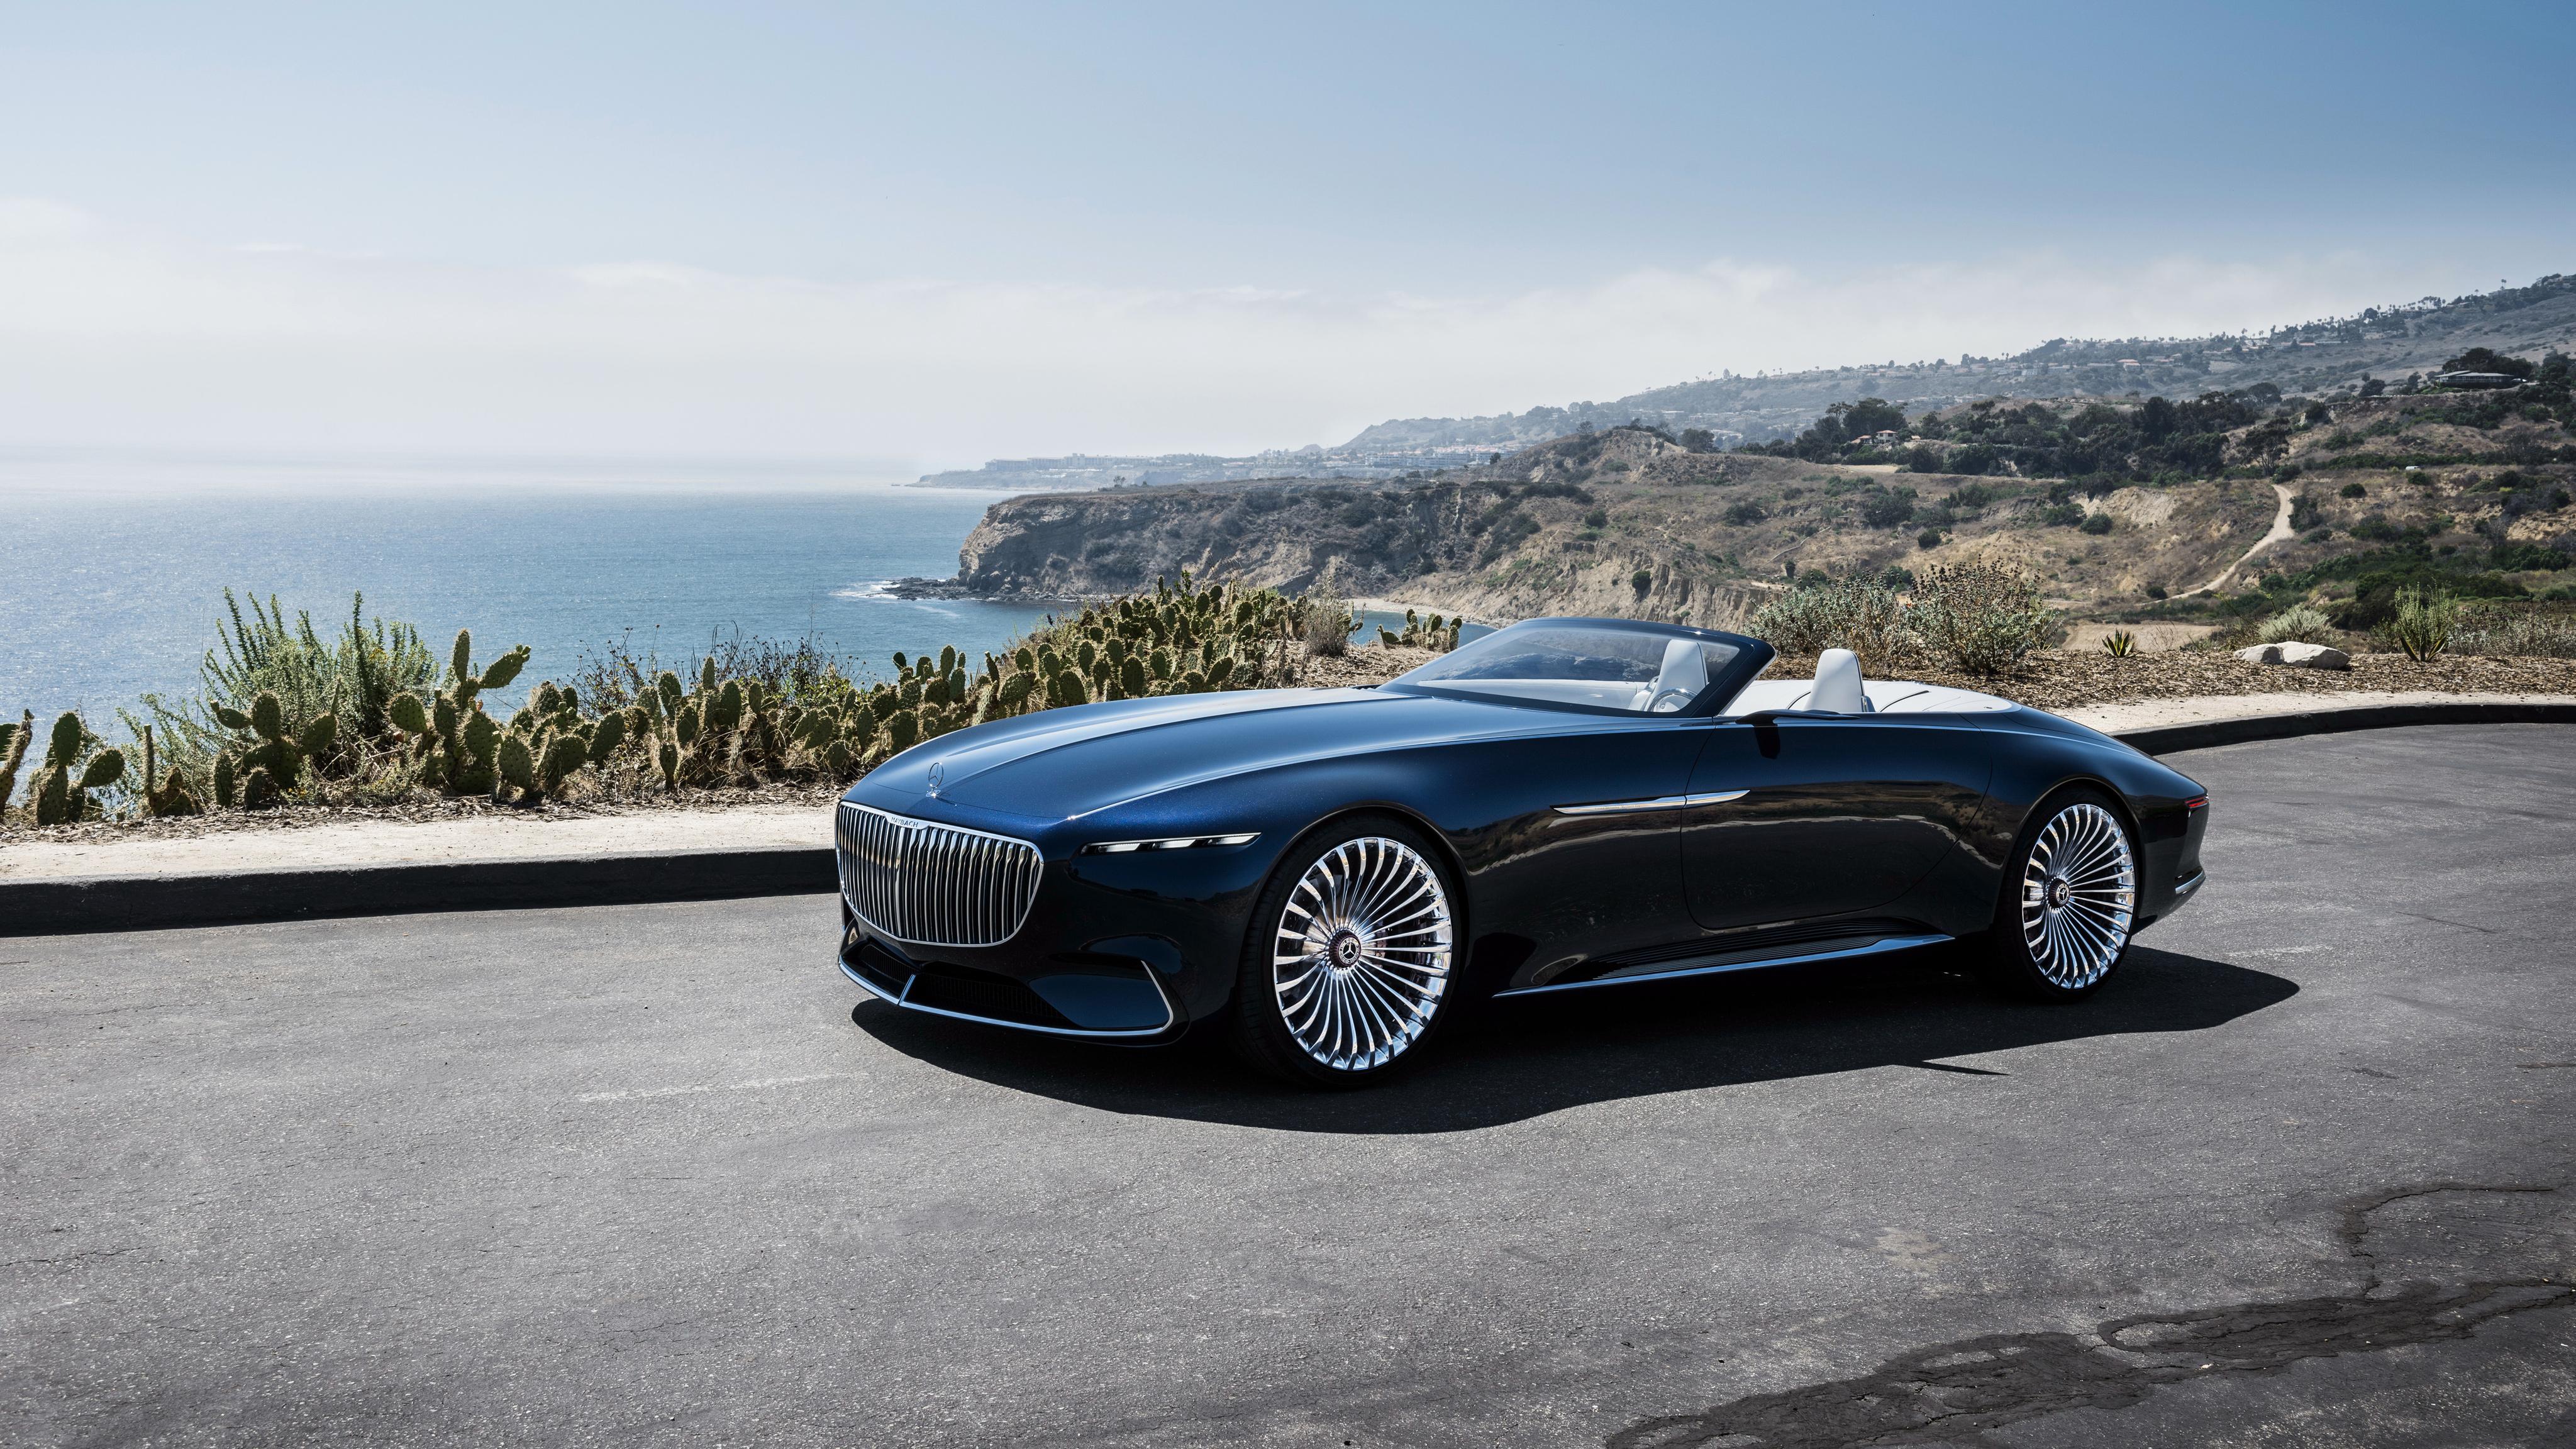 2018 vision mercedes maybach 6 cabriolet 5 wallpaper | hd car